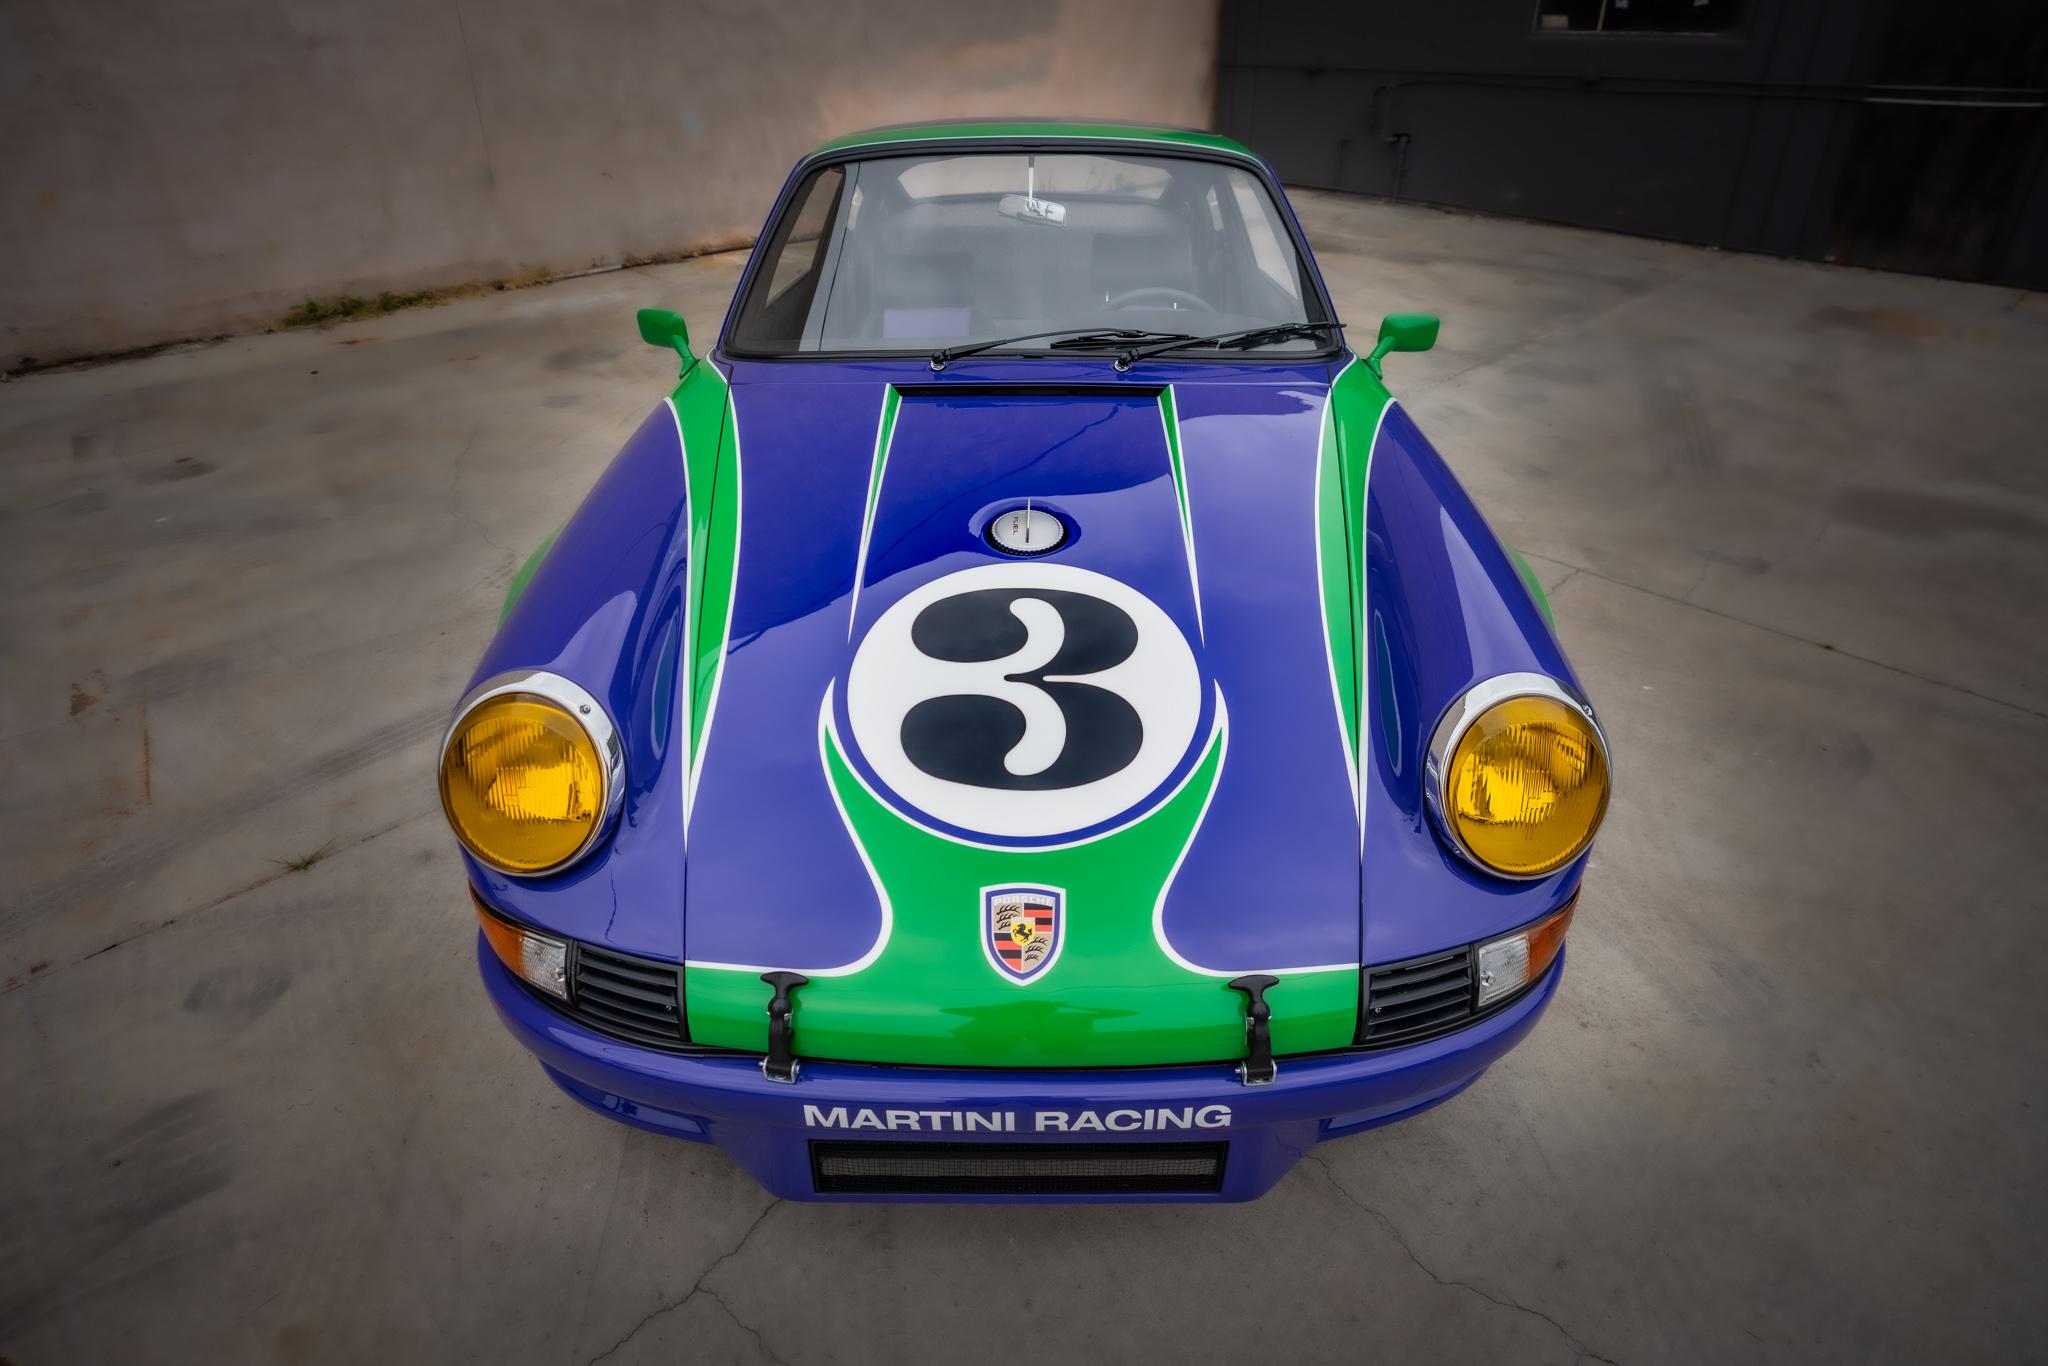 1973 Porsche 911 RSR Hippie nose view